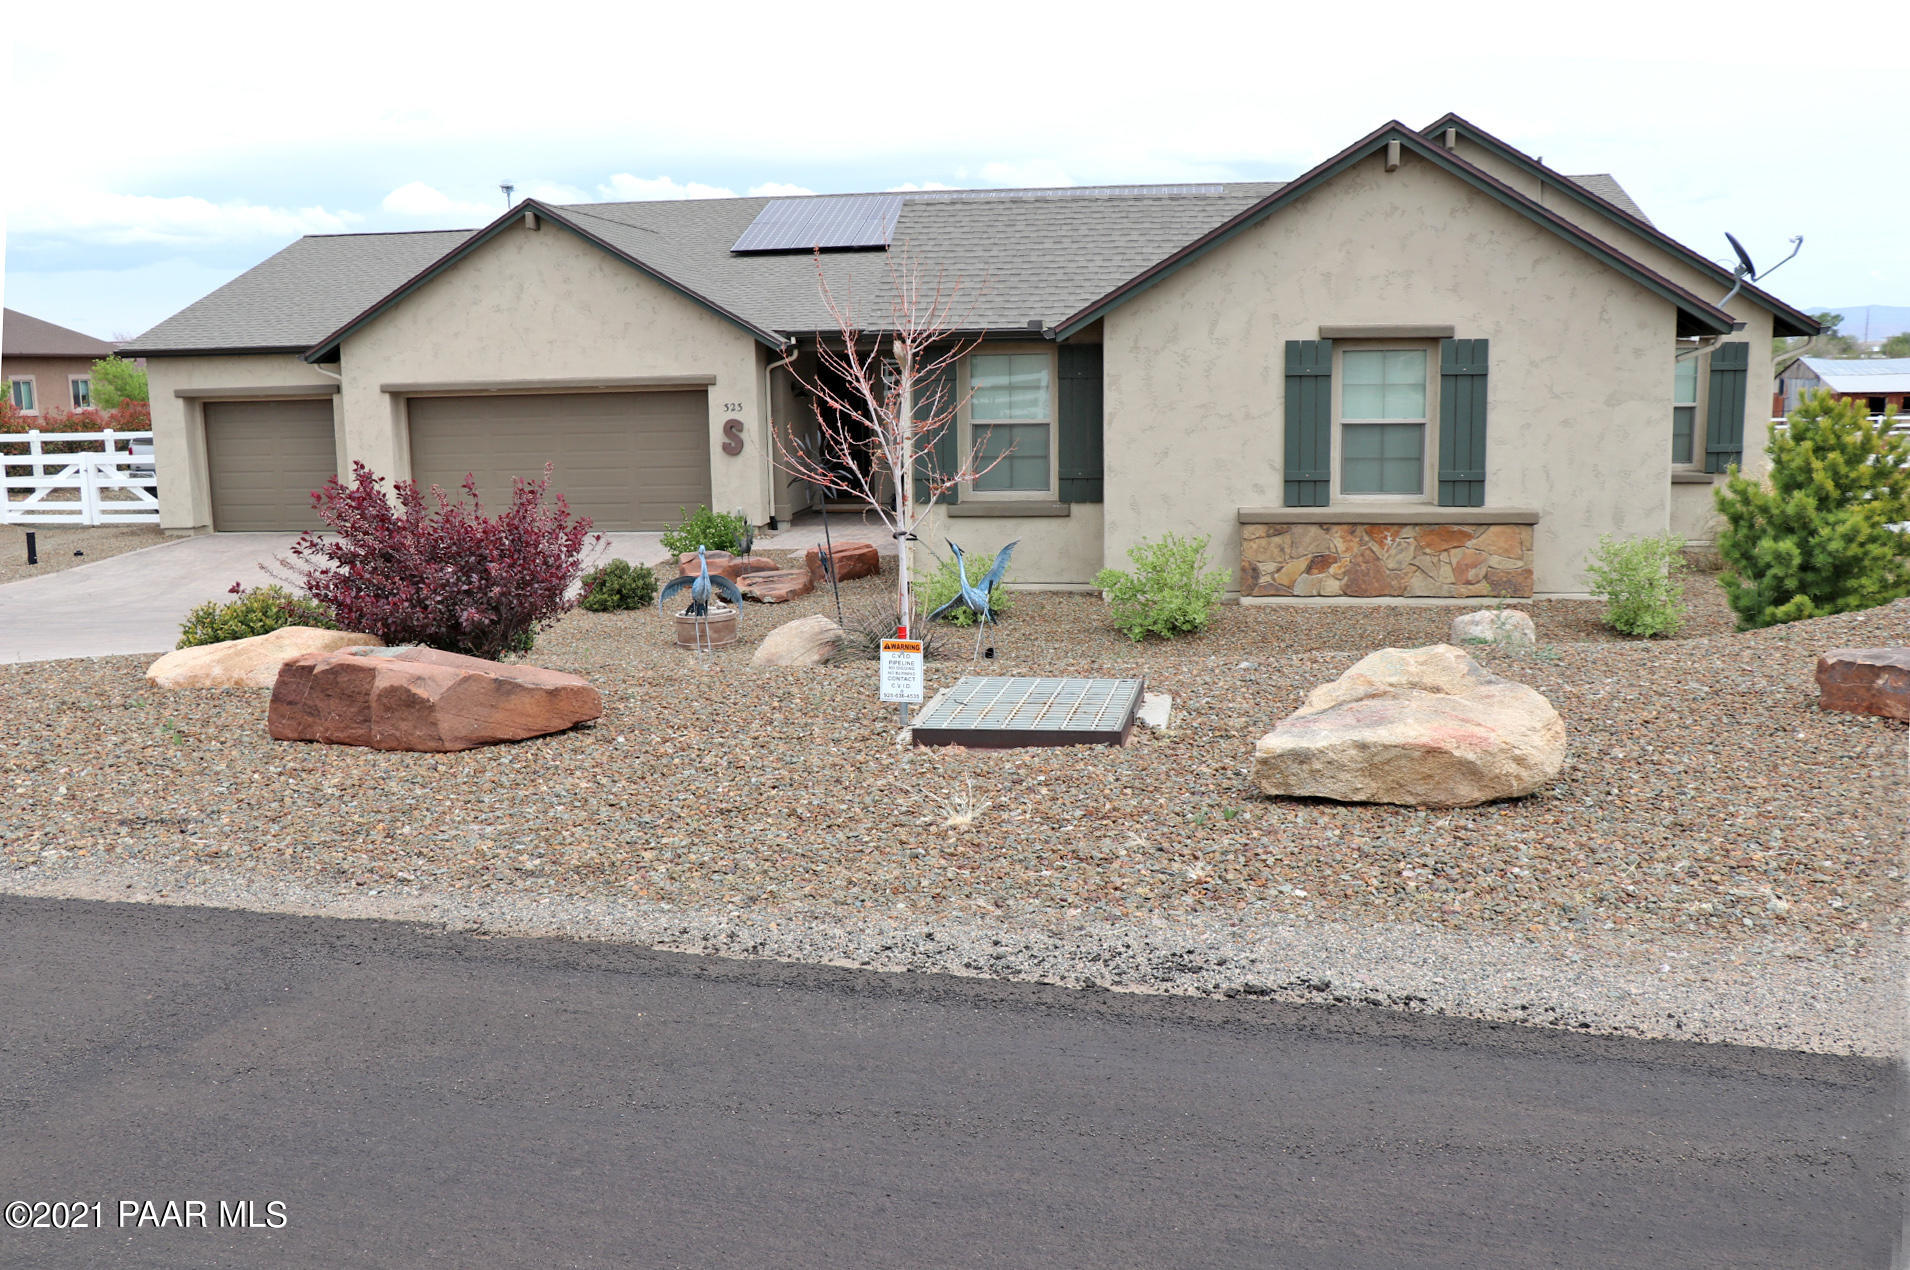 Photo of 323 Brent, Chino Valley, AZ 86323